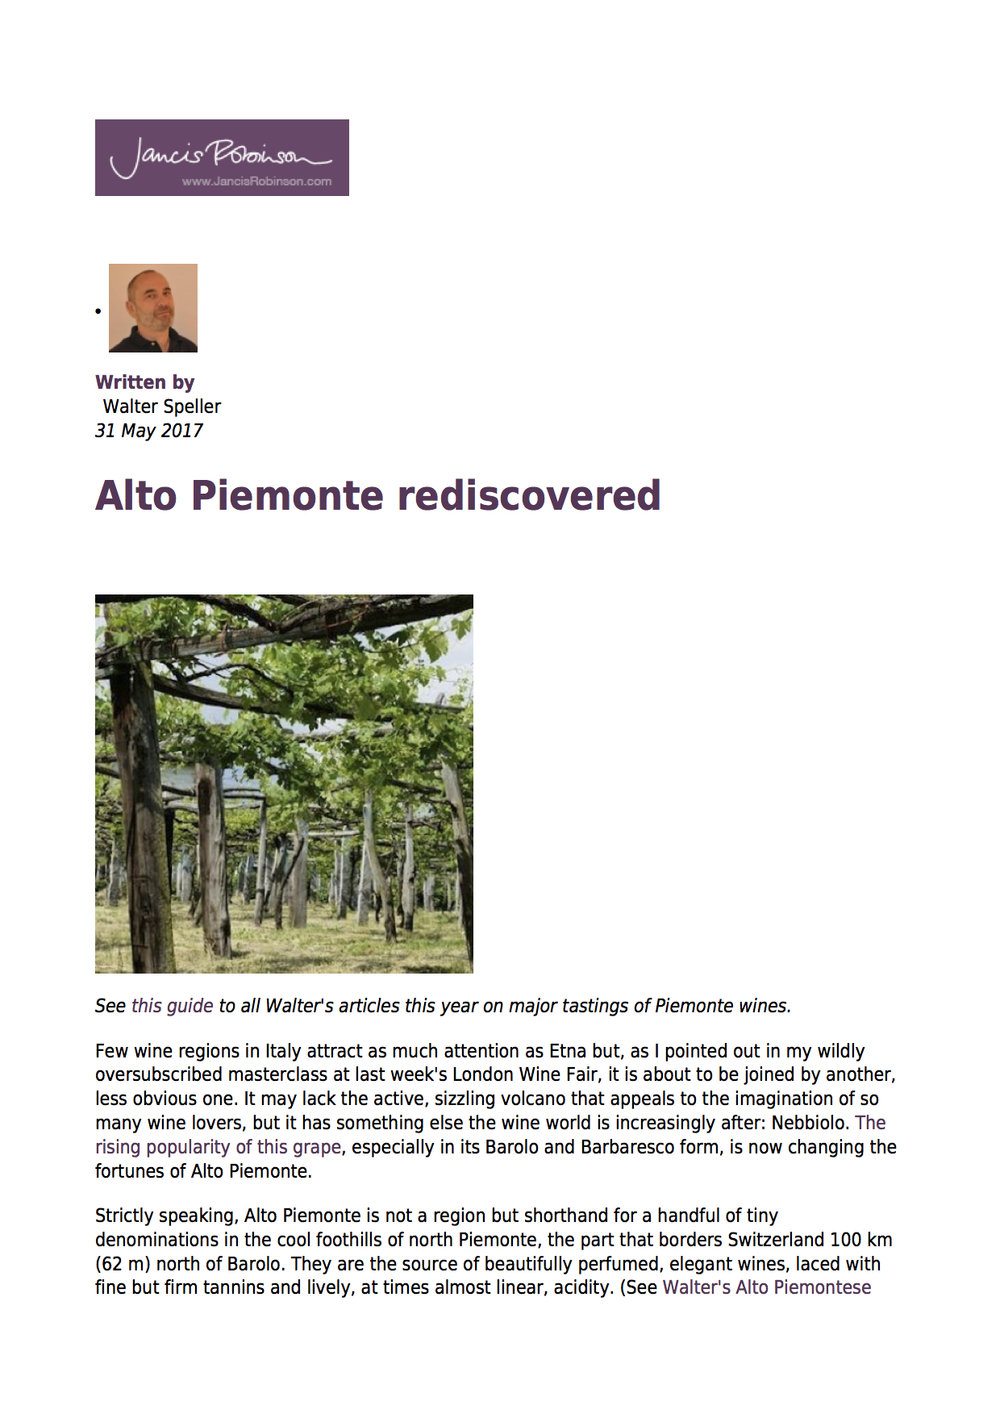 alto-piemonte-rediscovered pg1.jpg